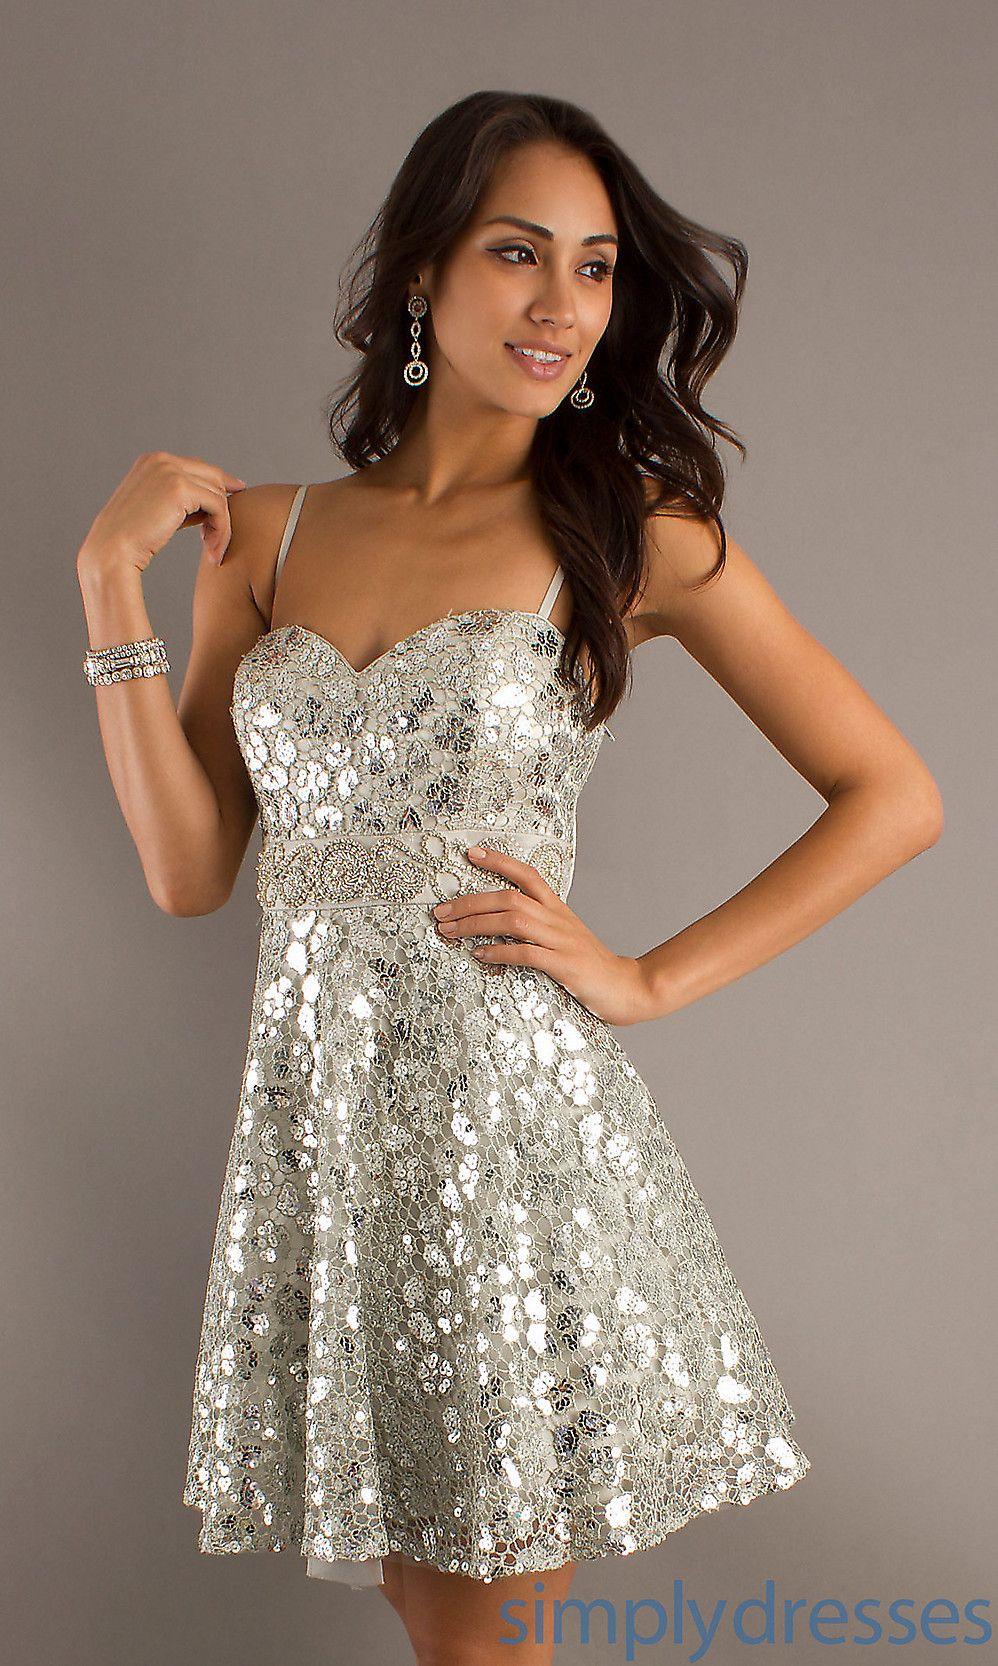 Cocktail dresses wedding  Dress Short Sequin Embellished Silver Sweetheart Dress  Simply